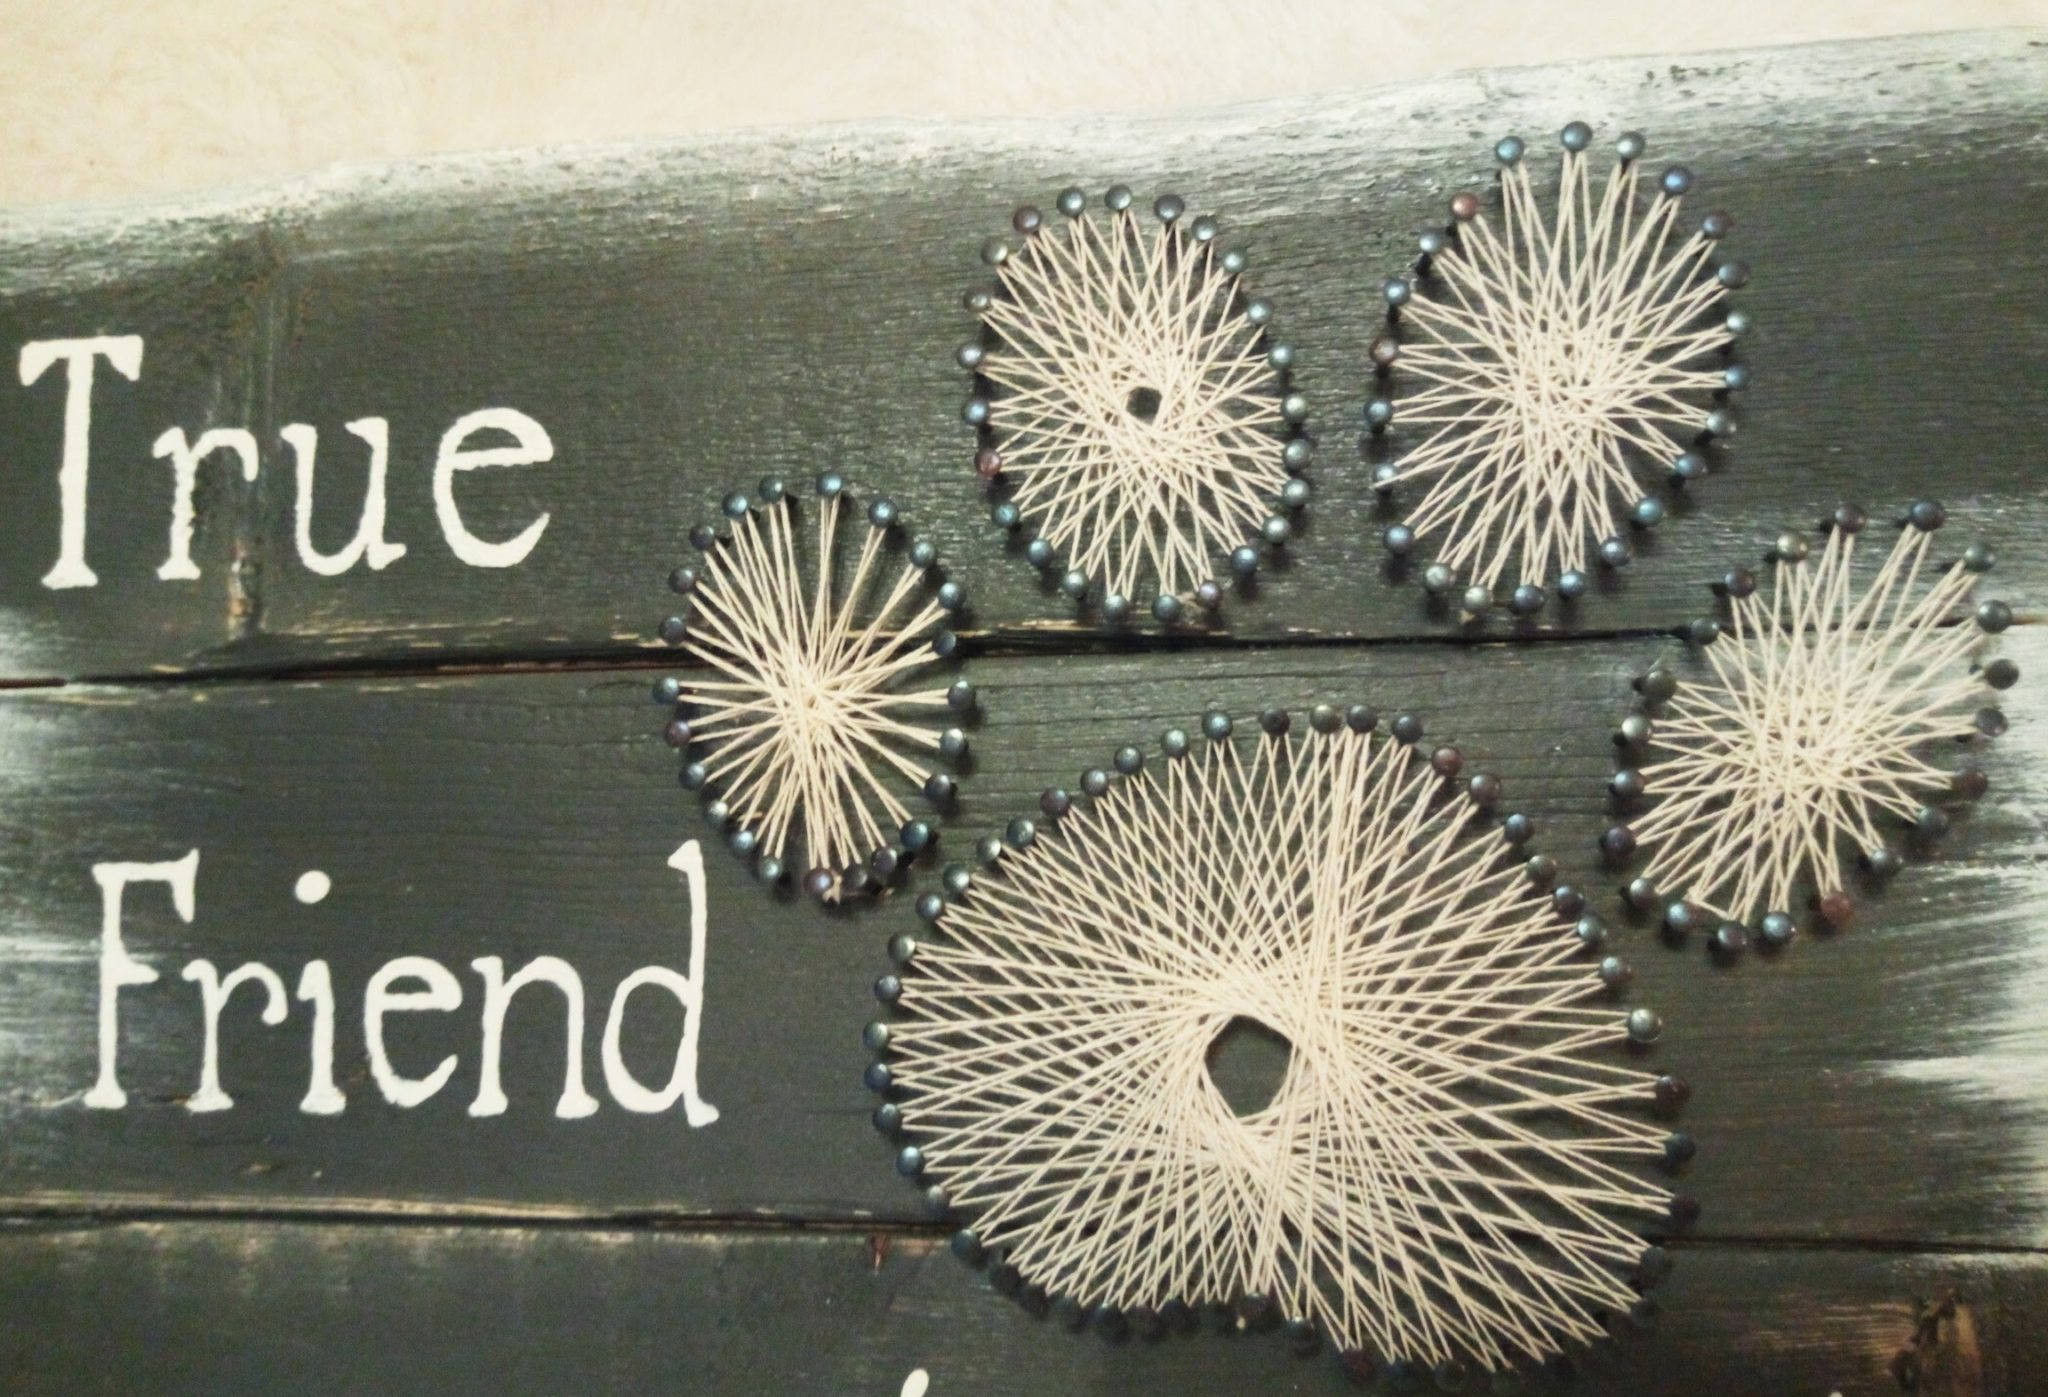 Deco-bordje: A true friend leaves pawprints (string-art)